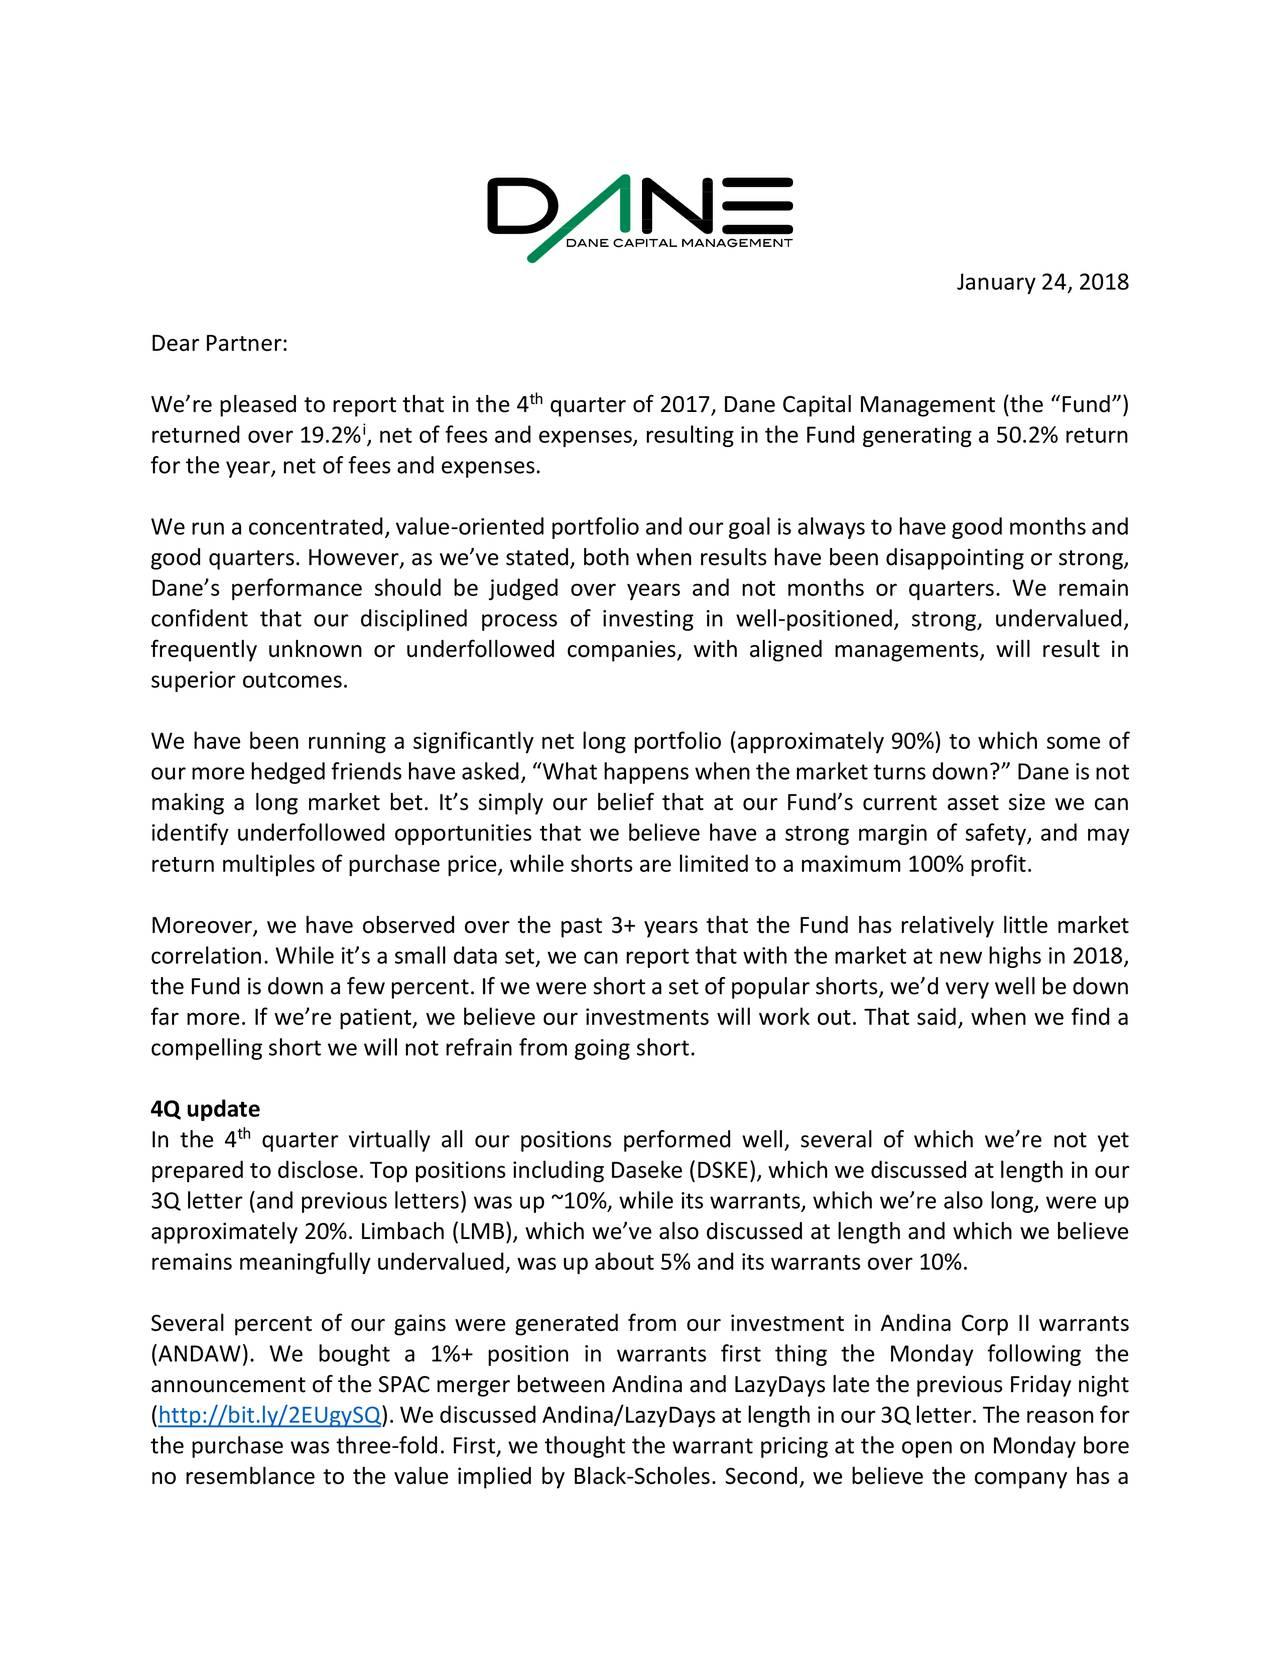 Dane Capital Management Q4 2017 Investor Letter | Seeking Alpha